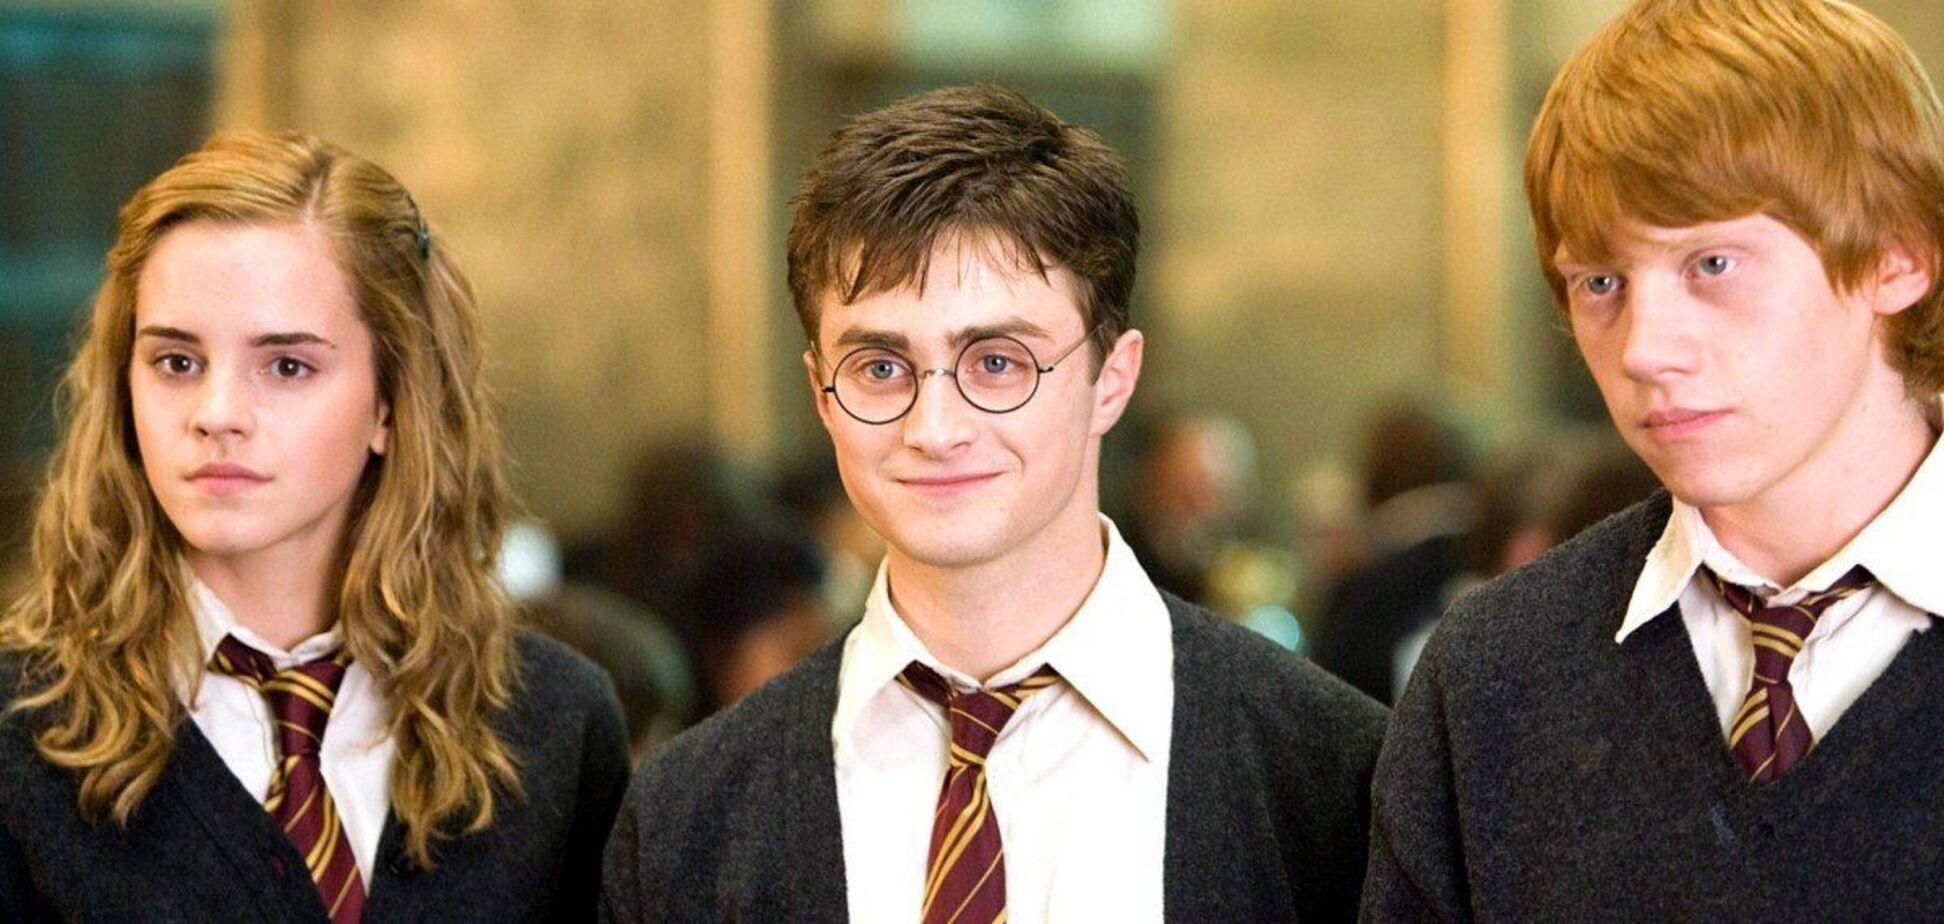 Кадр із фільму 'Гаррі Поттер'